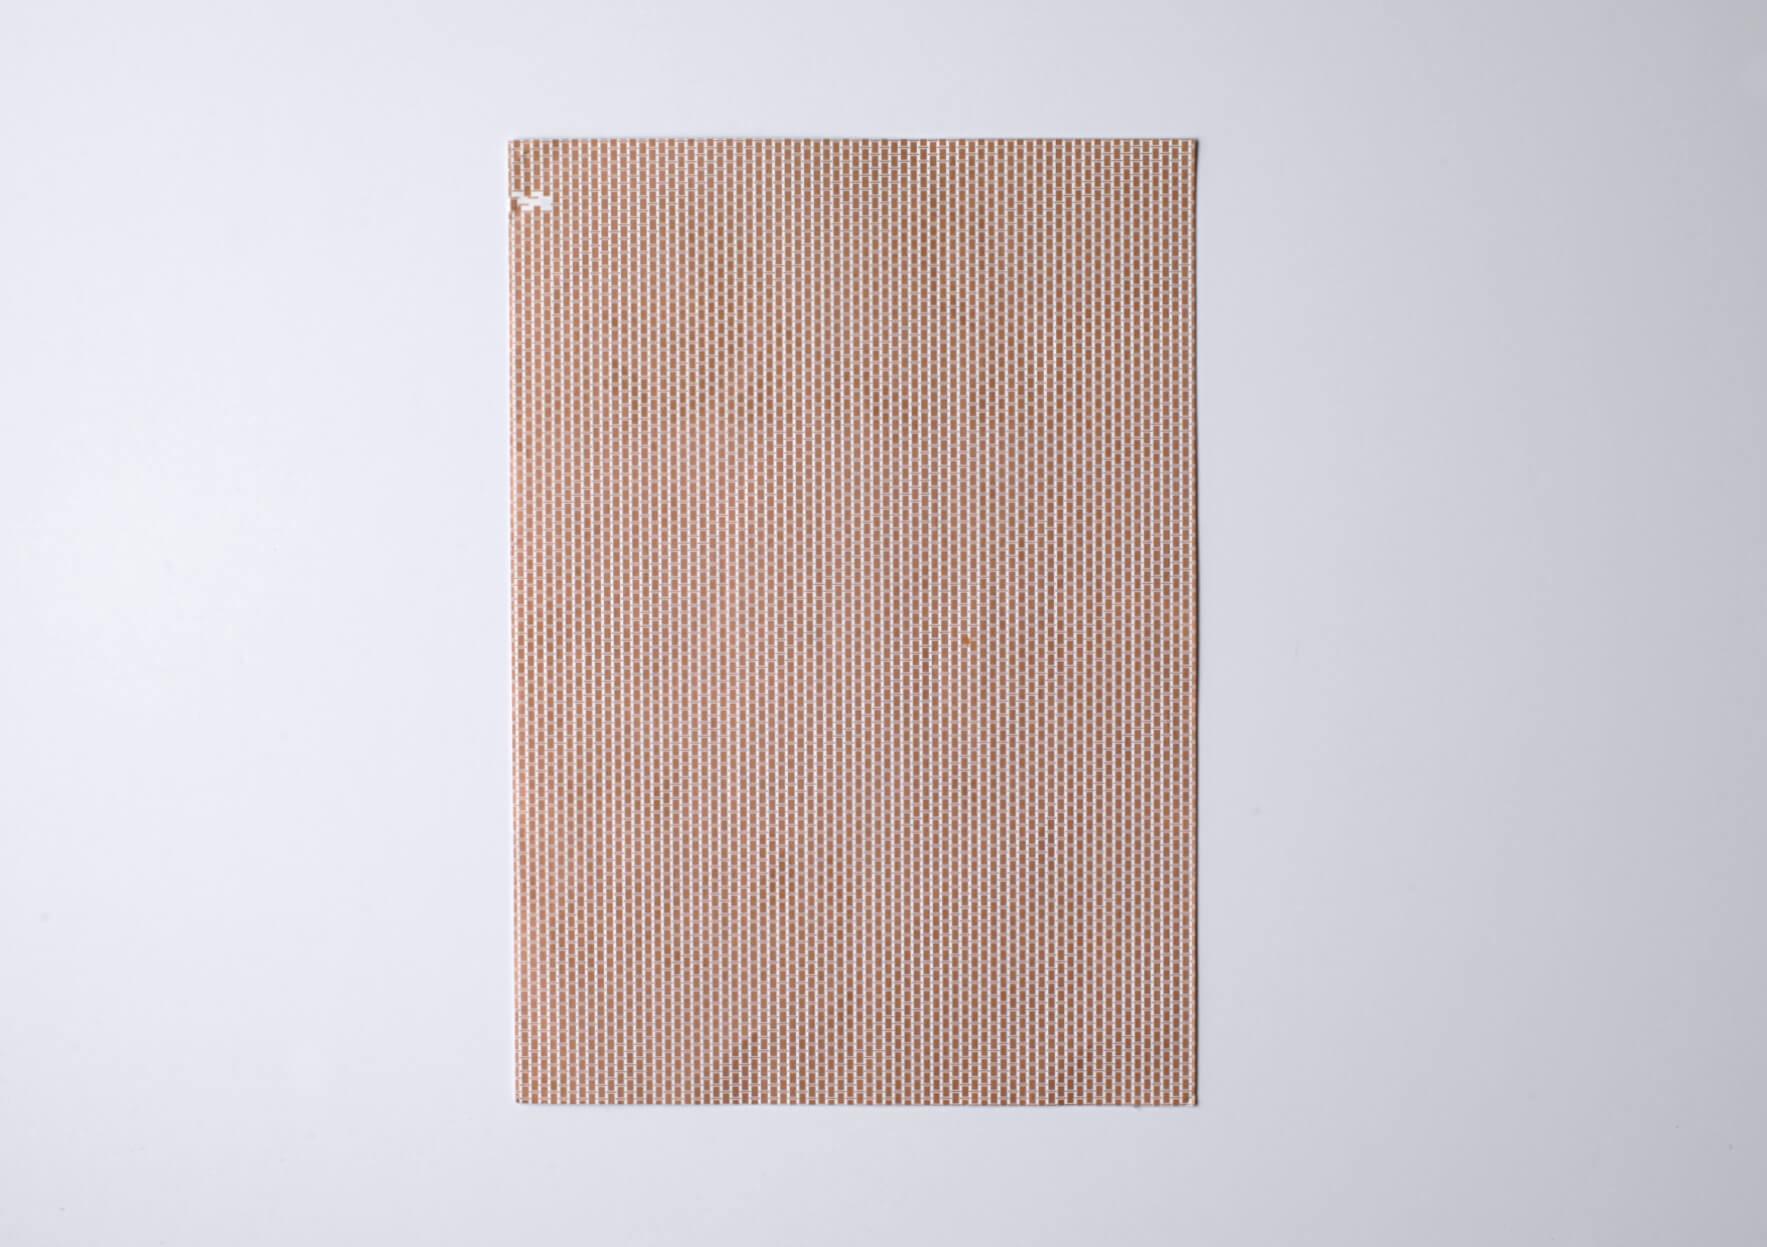 Haegue Yang Luft und Wasser, 2002 Ed. 600, 21 x 30 cm Ed. Dresdner Bank | Mother | ProjecteSD